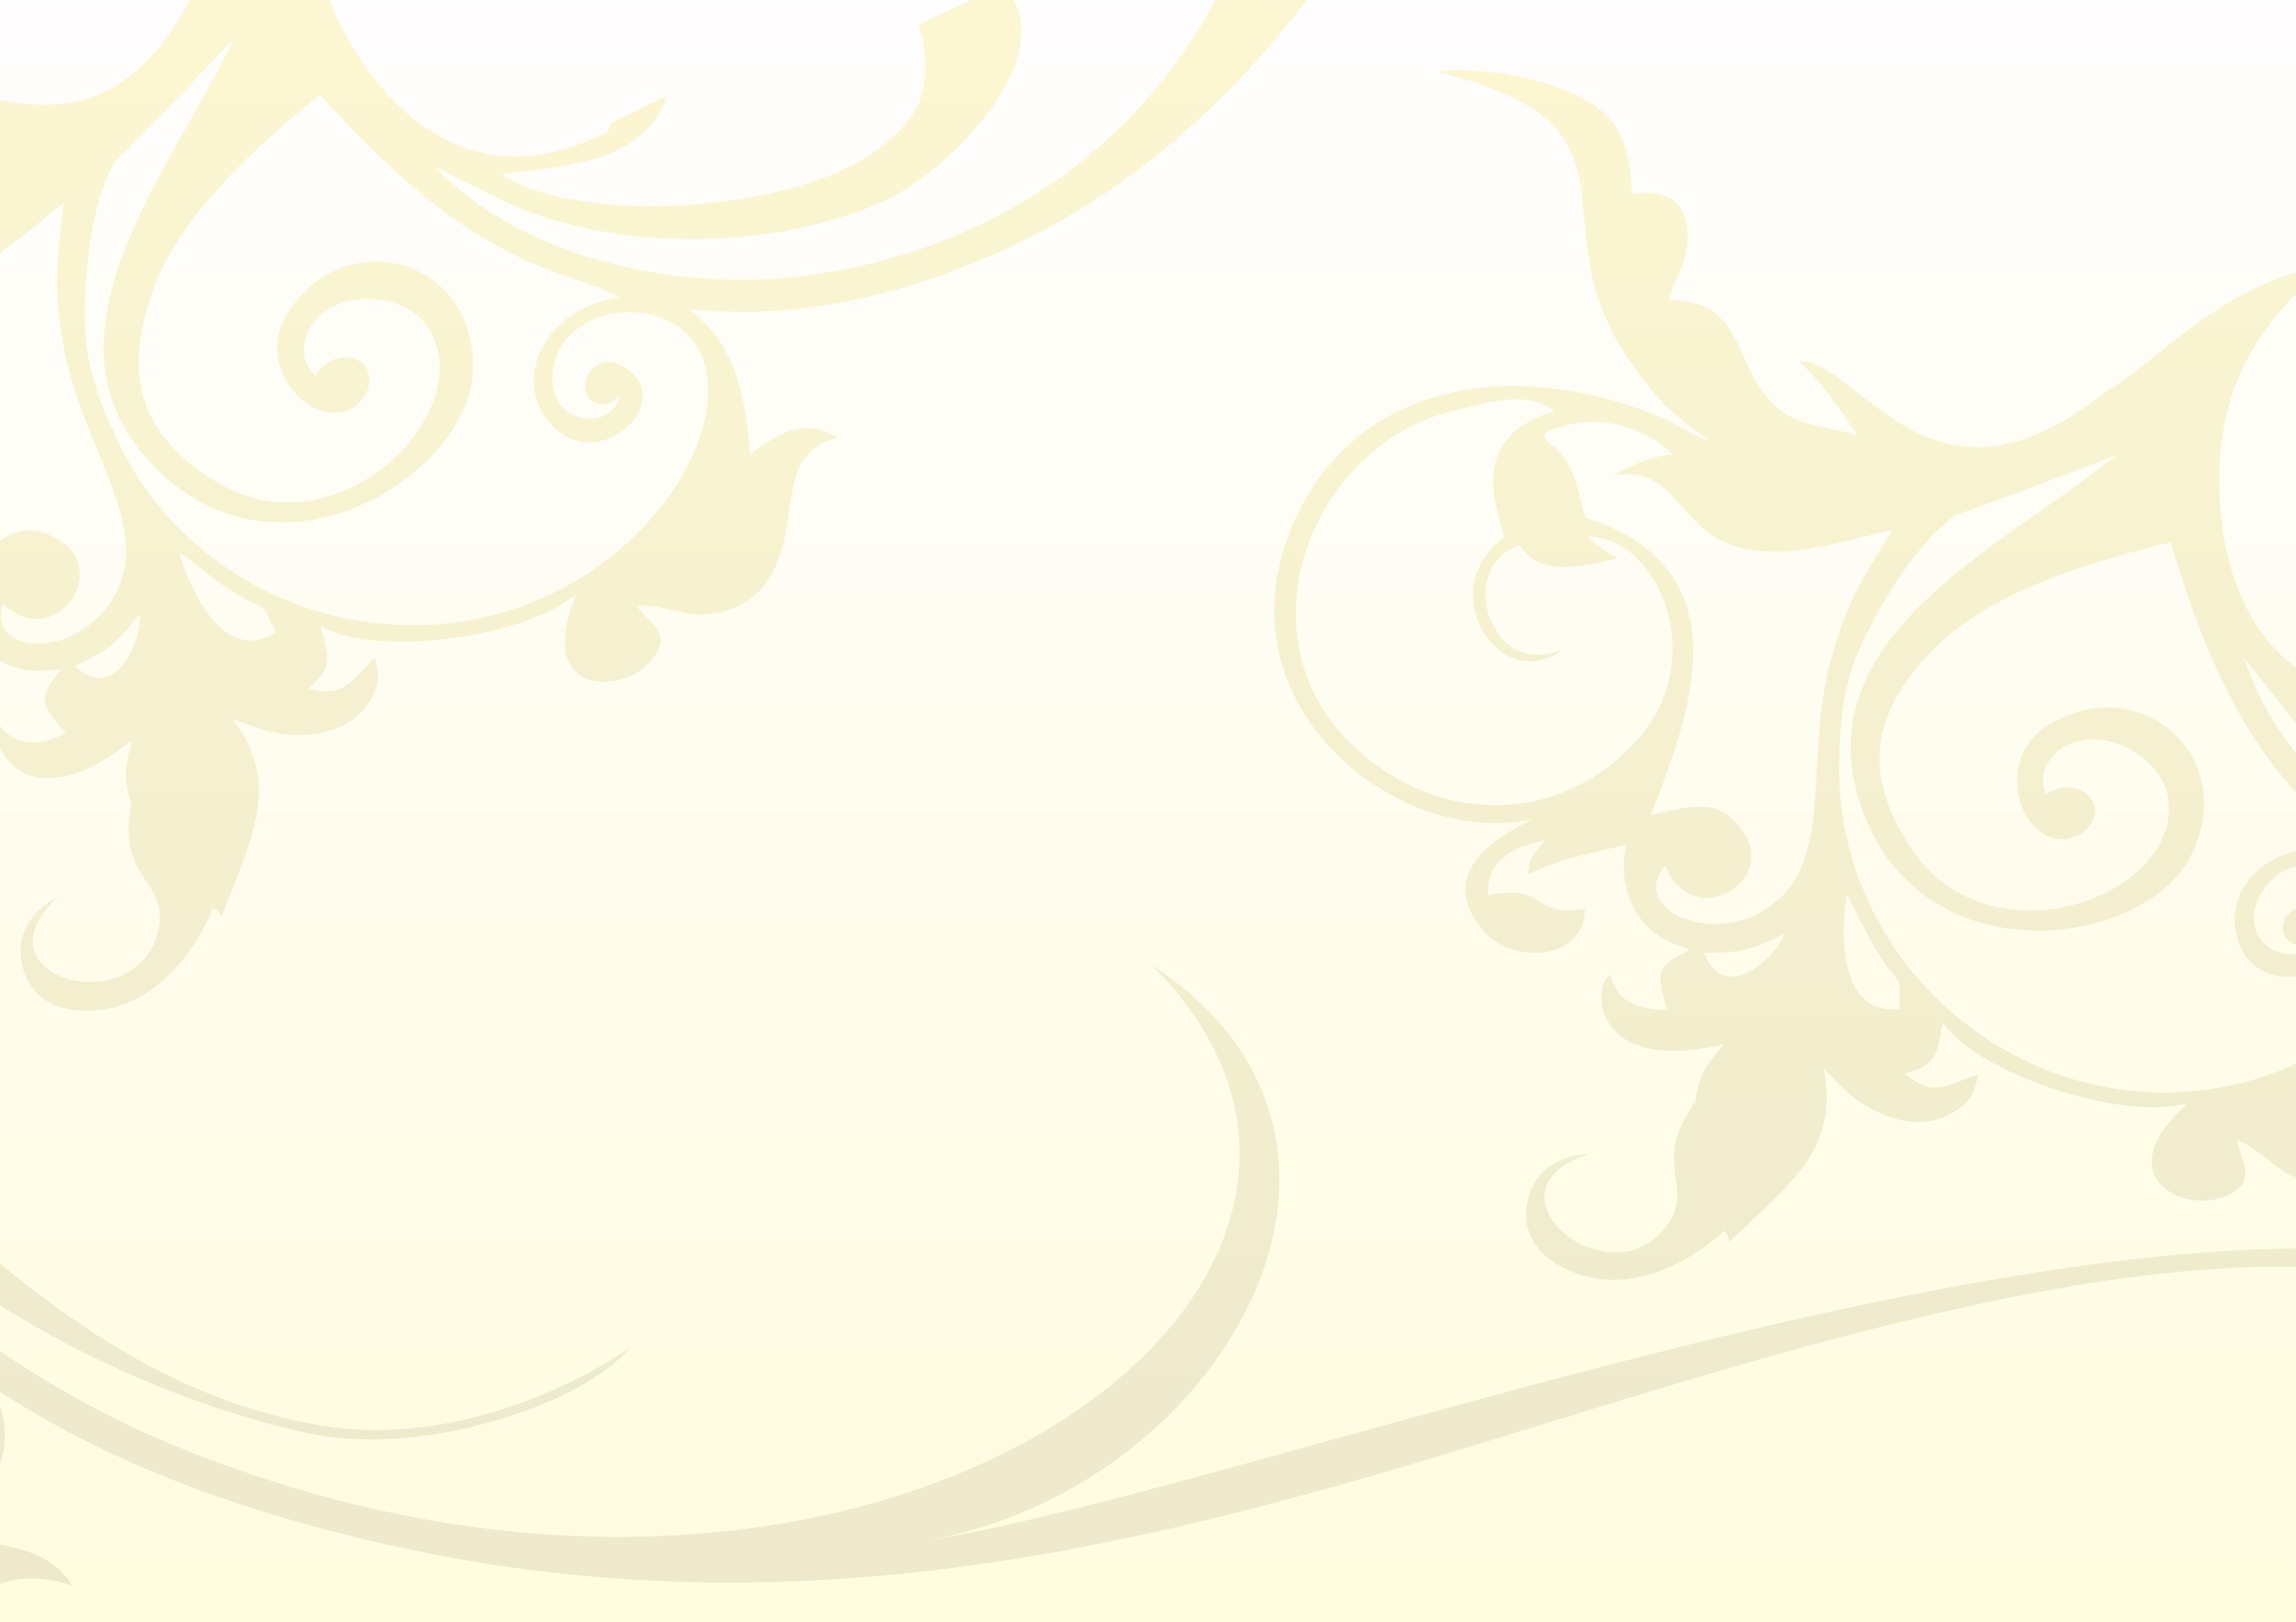 wallpaper pattern background light line texture 5000x3532